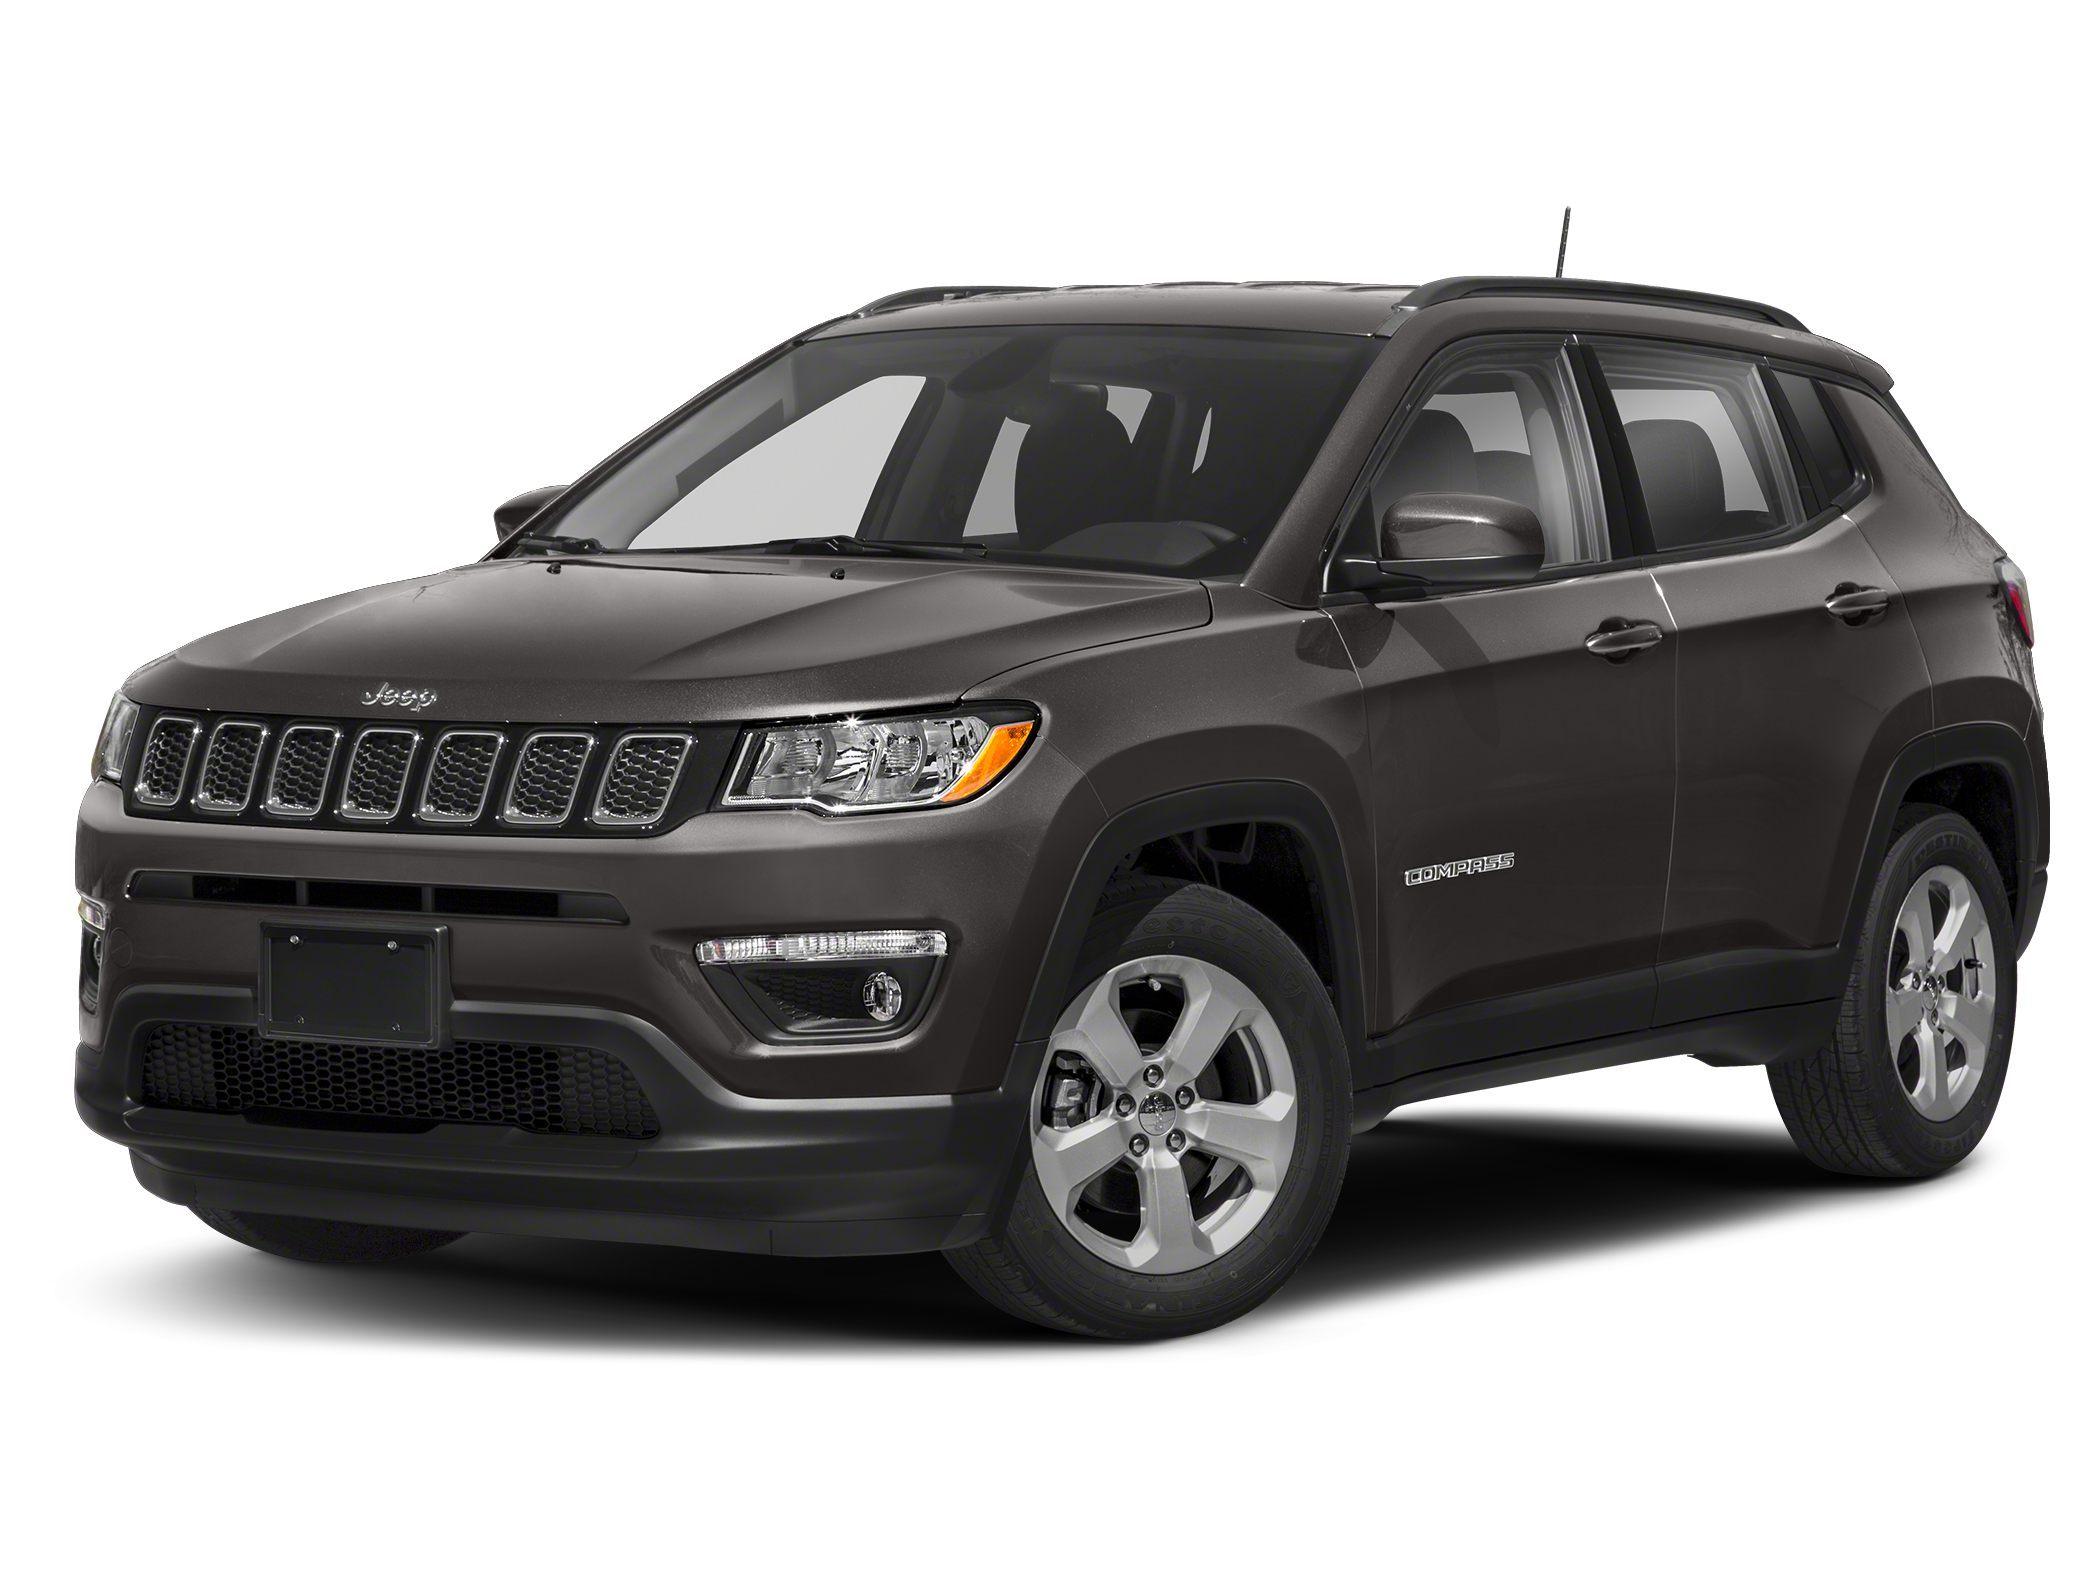 2019 Jeep Compass SUV